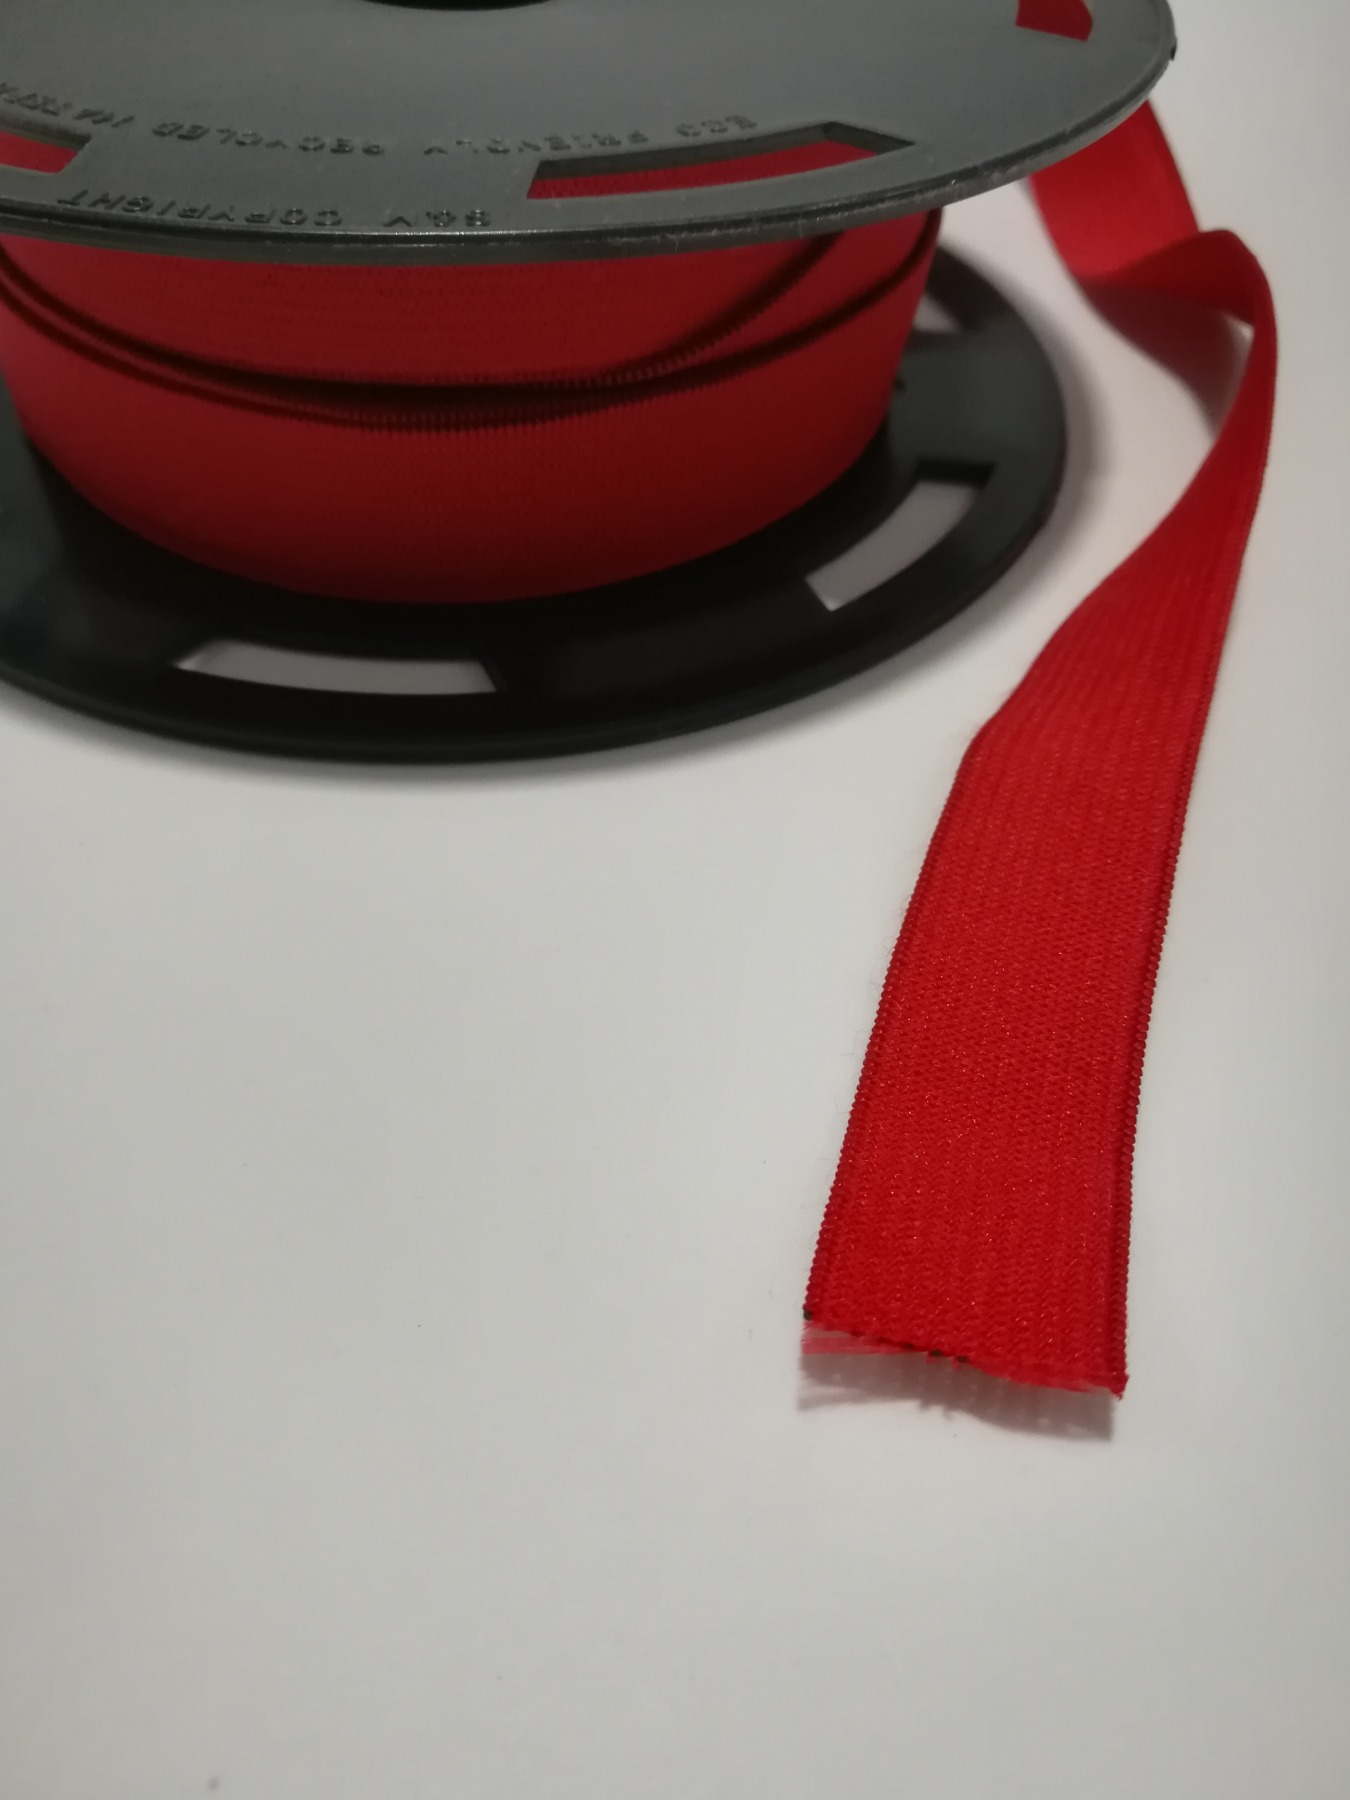 Flachgummi 2cm breit rot